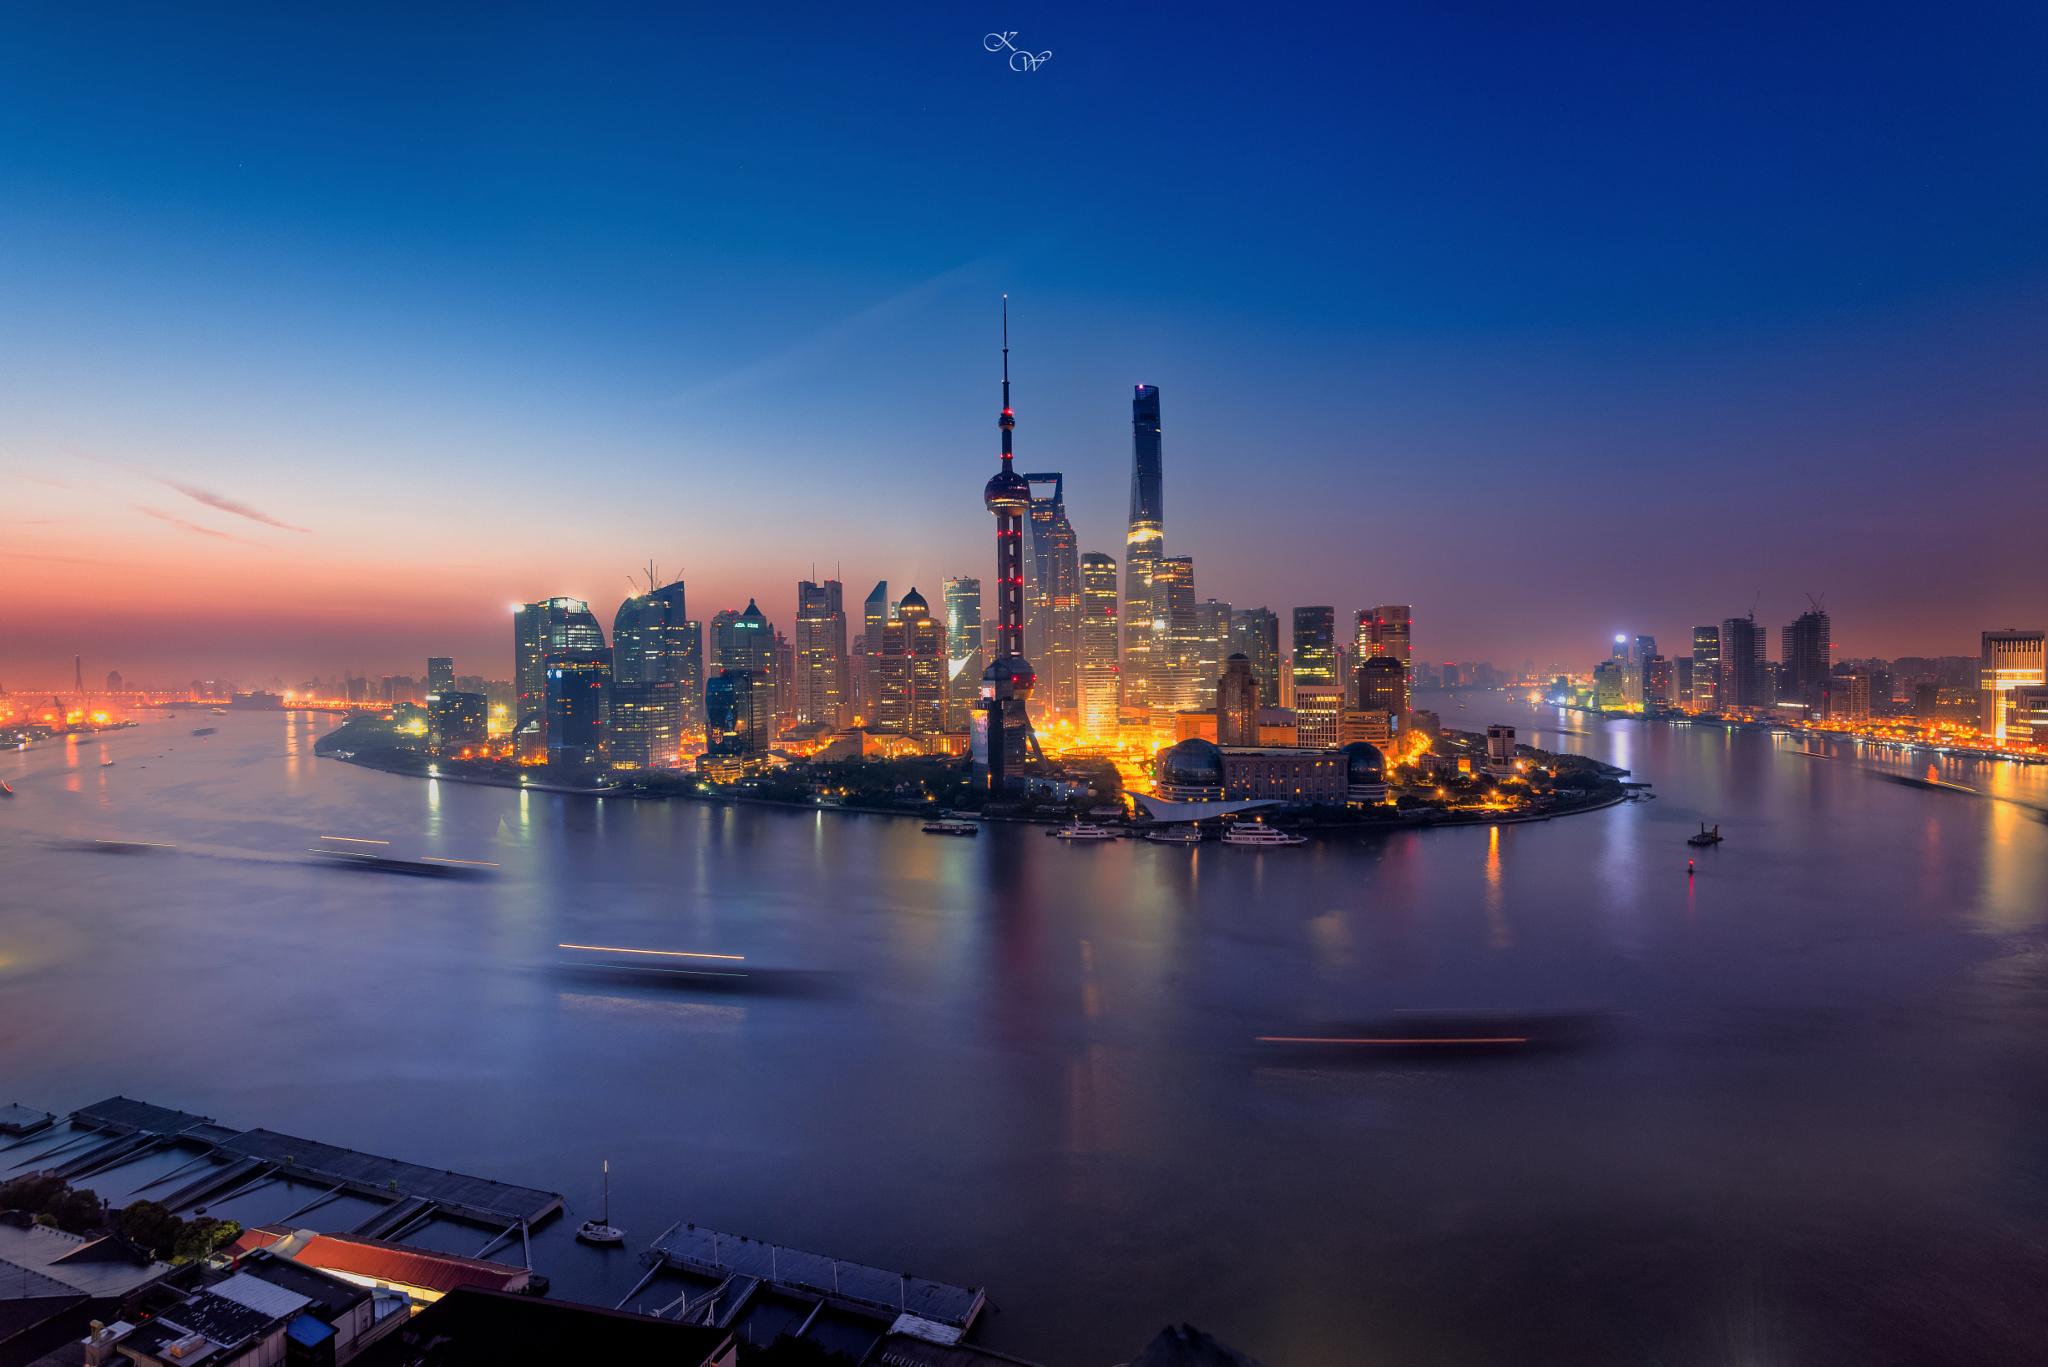 General 2048x1367 city long exposure water city lights Shanghai China